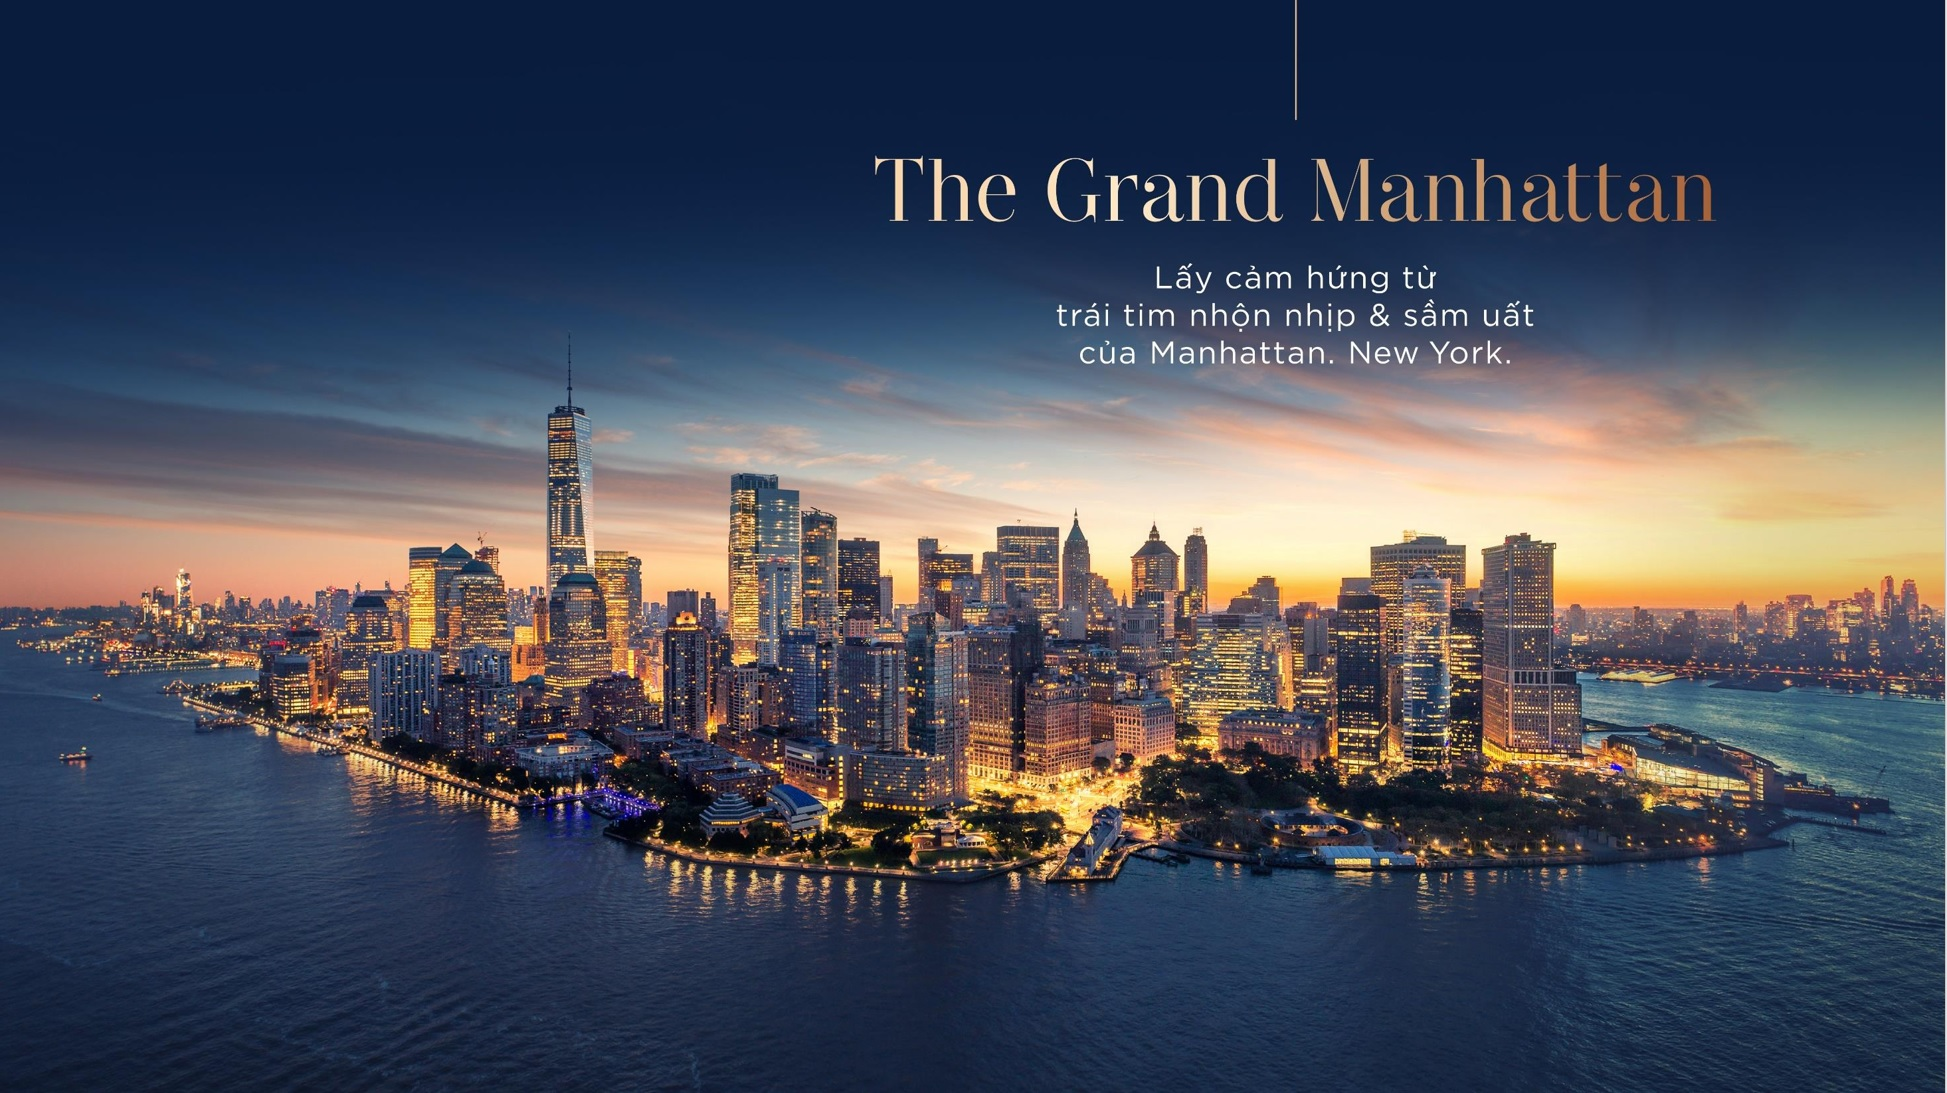 dự án The Grand Manhattan